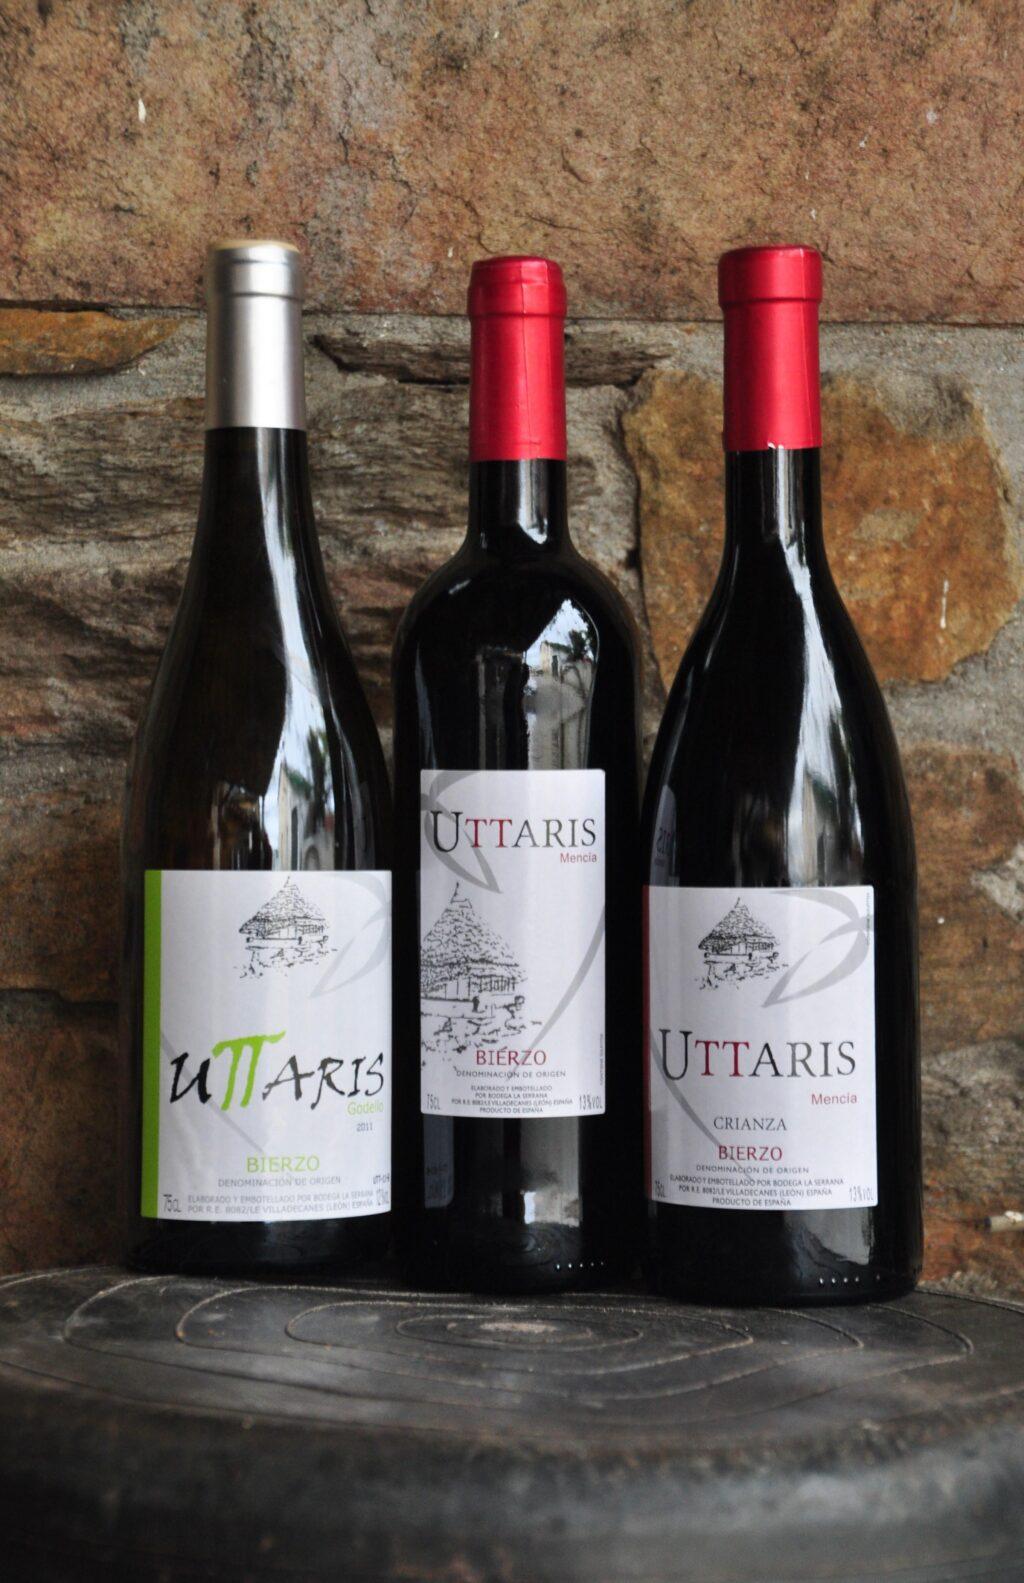 wines from bierzo